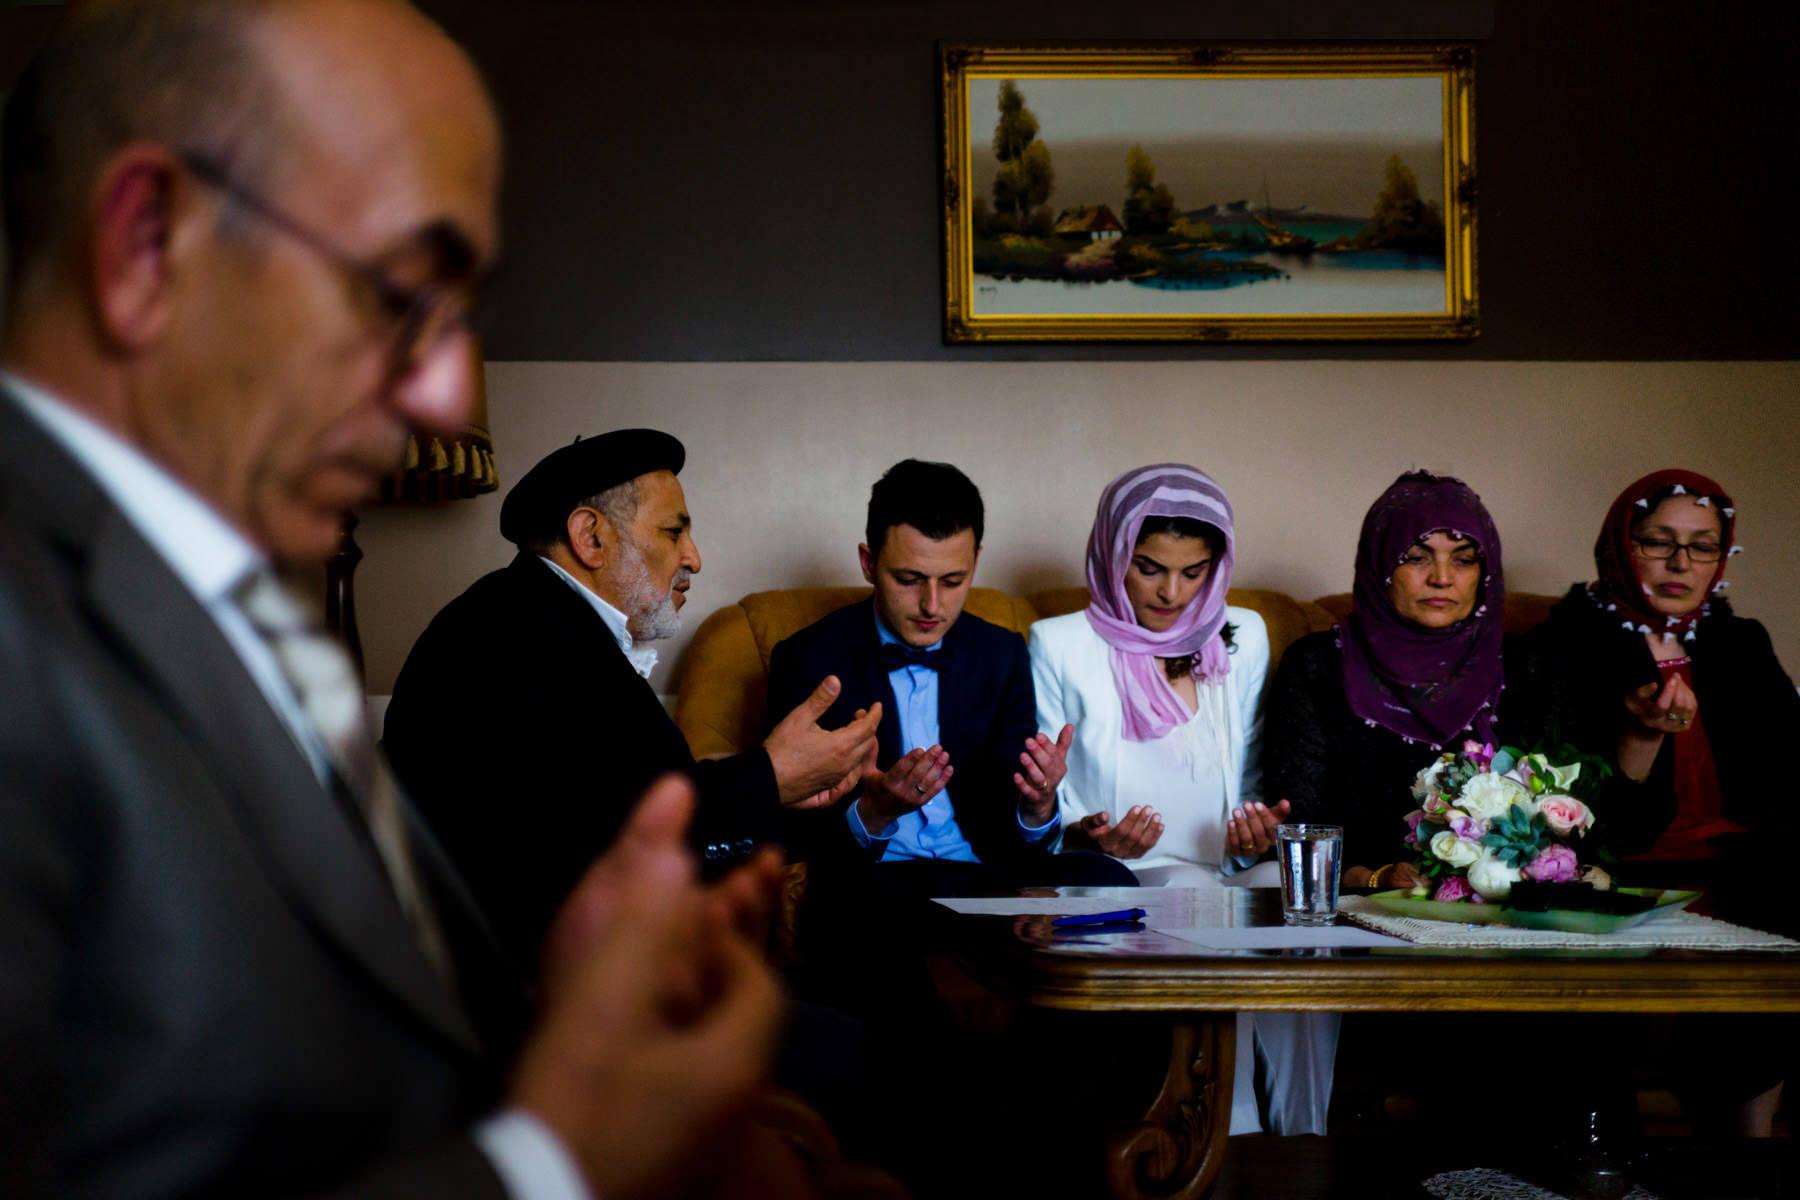 narracia-wygledacz-photographe-mariage-portfolio-51.jpg